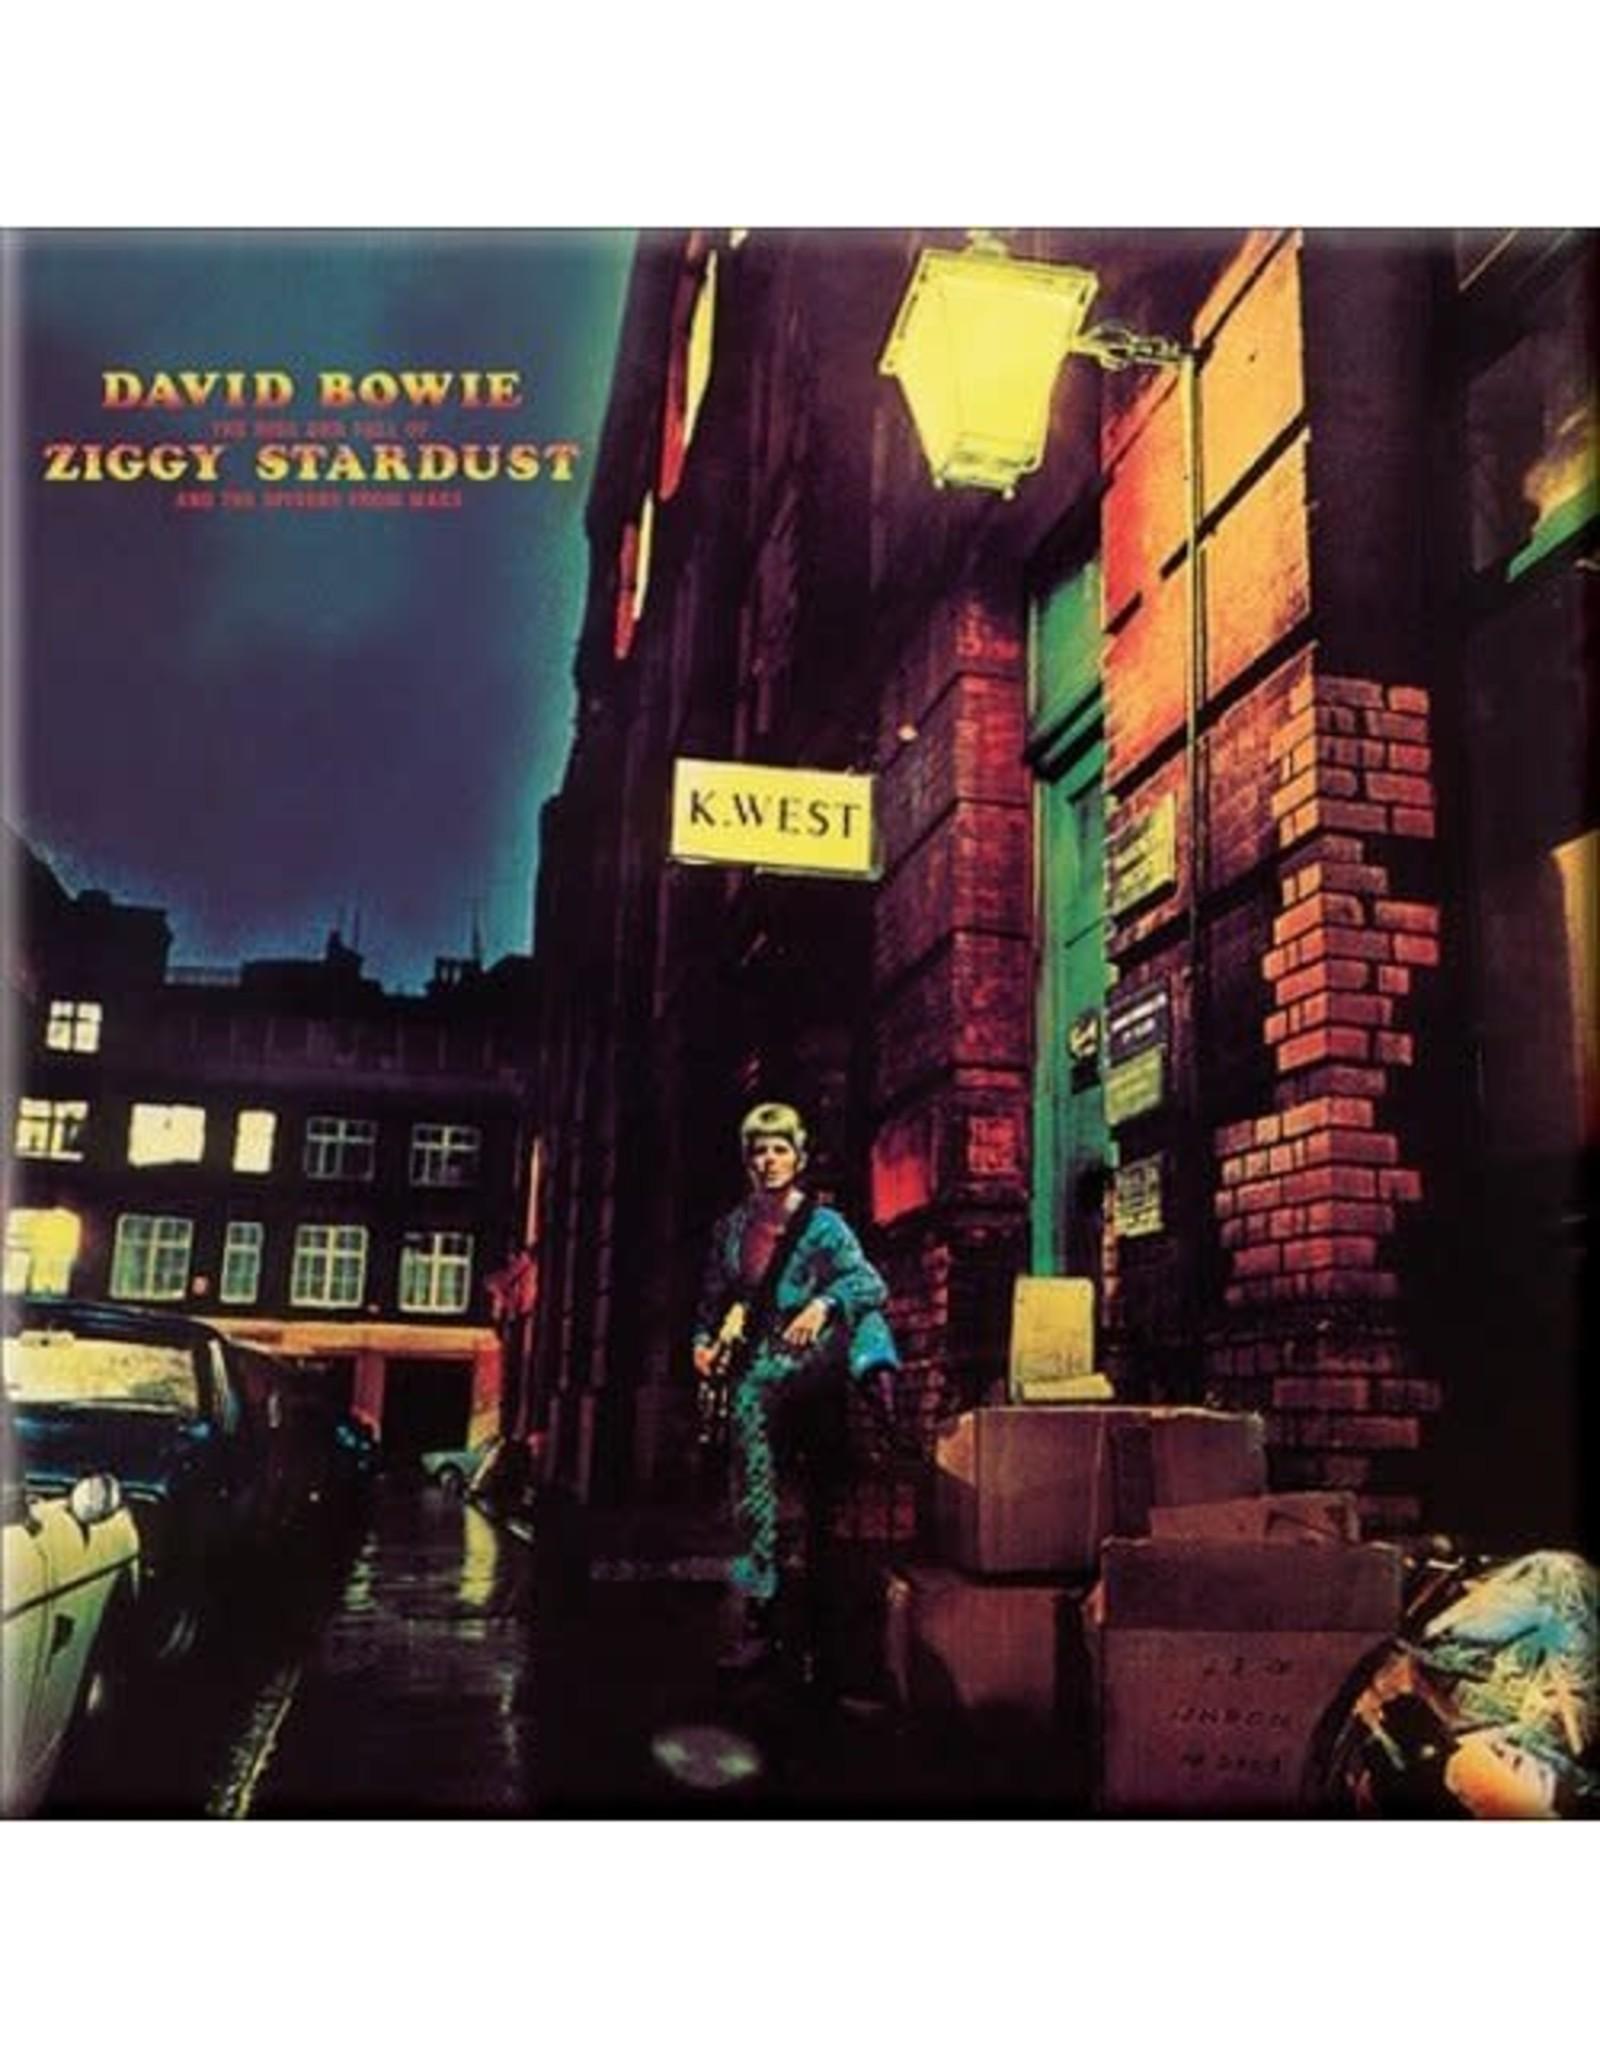 David Bowie / Ziggy Stardust Magnet